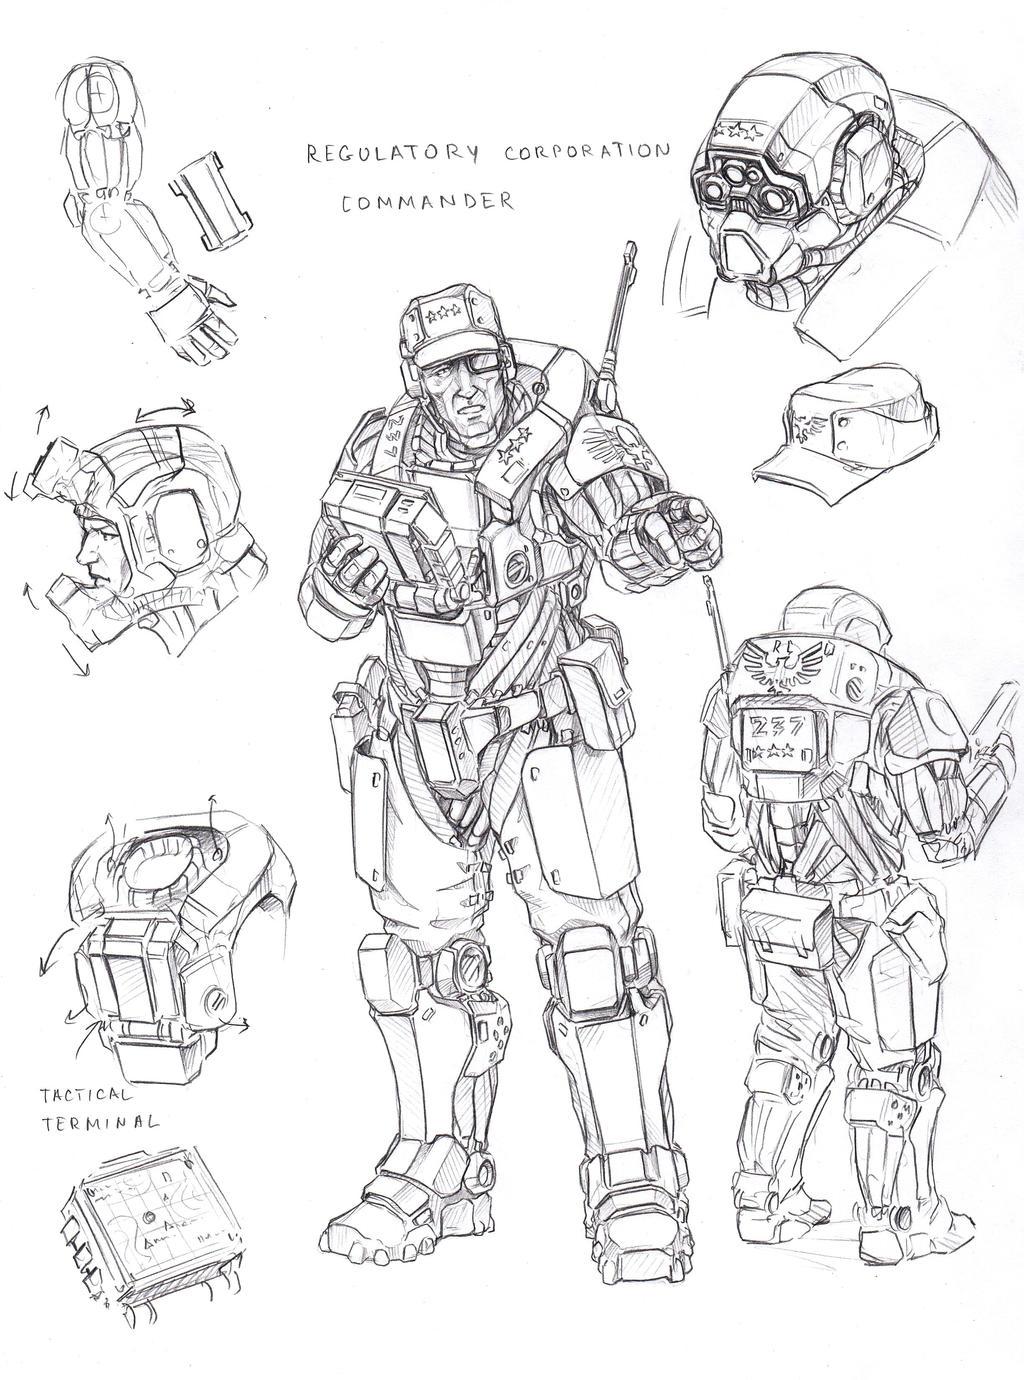 RC Commander by TugoDoomER